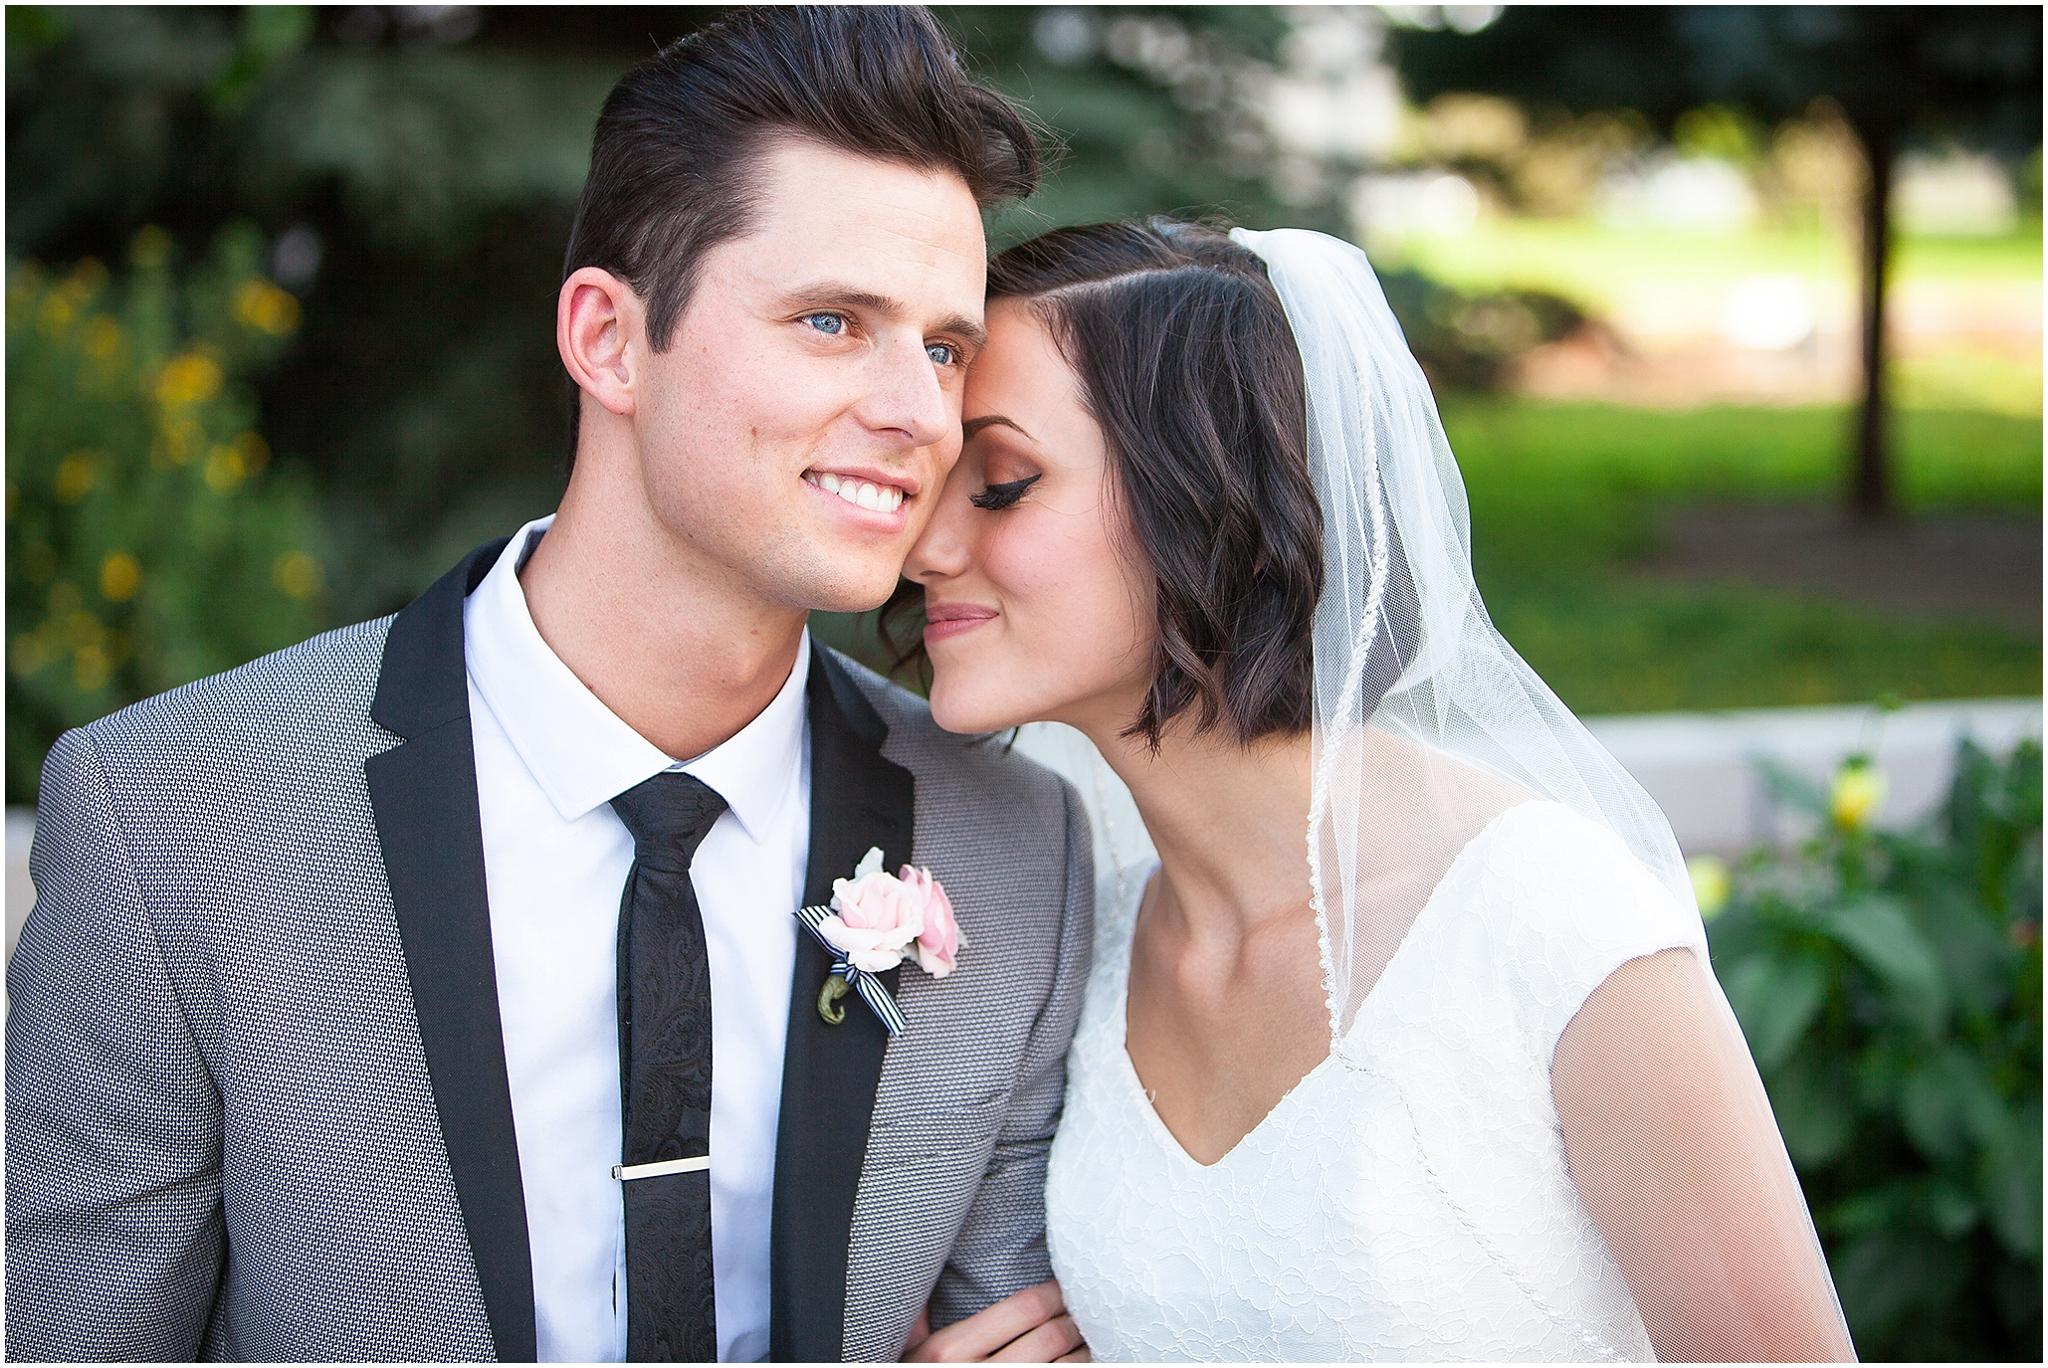 IMG_9981-Edit-98_Lizzie-B-Imagery-Utah-Wedding-Photographer-Salt-Lake-City-Park-City-timpanogos-Utah-Temple.jpg